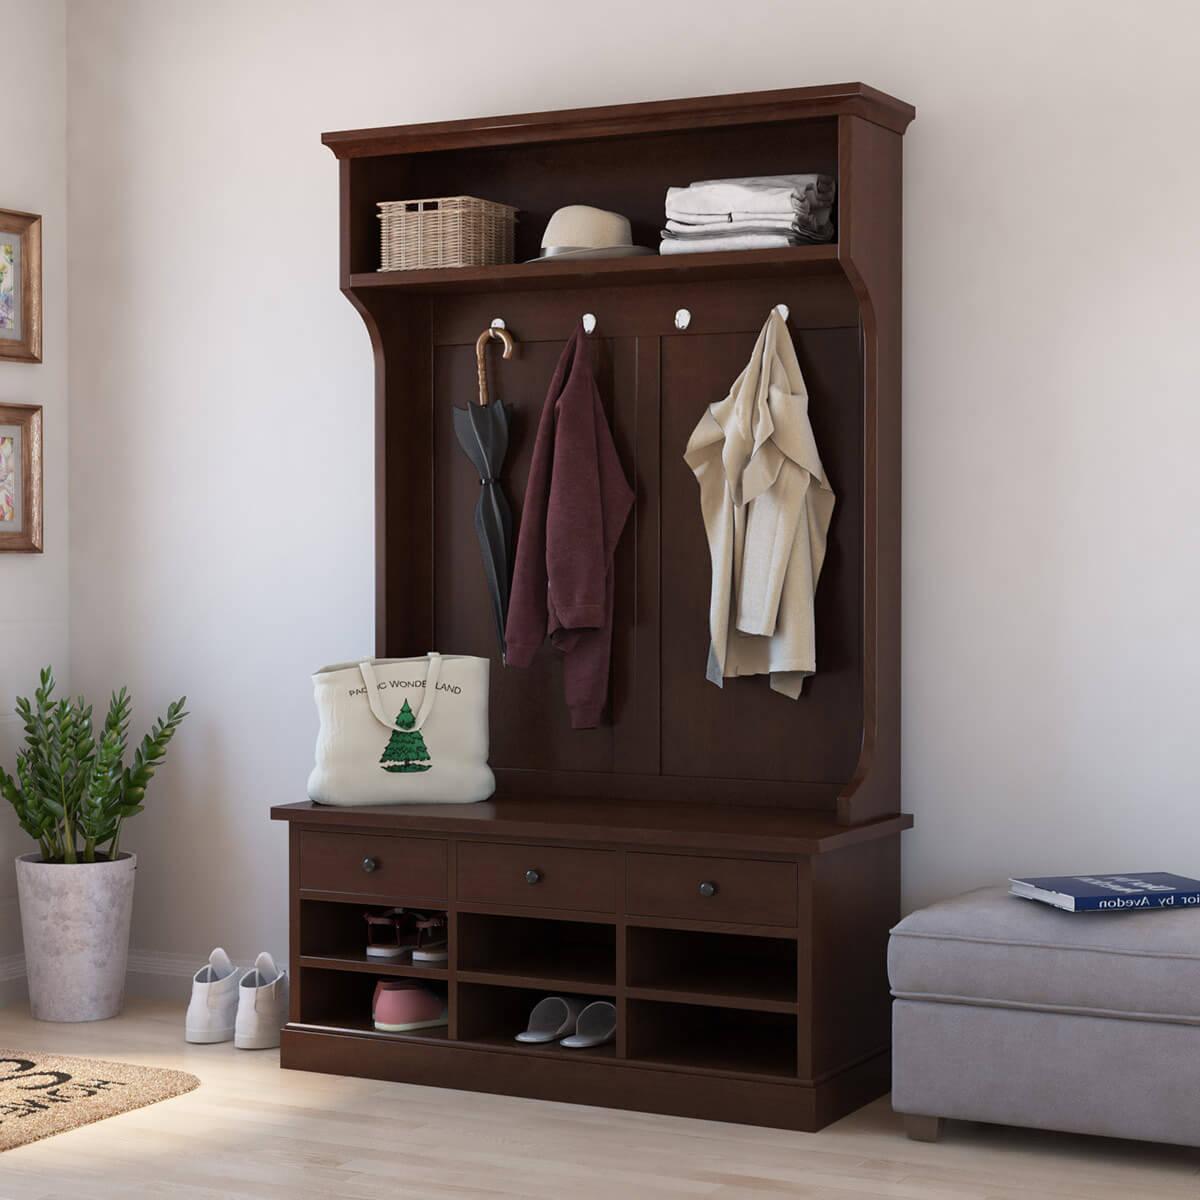 Mesmerizing Shoe Storage Cabinet and Racks Design